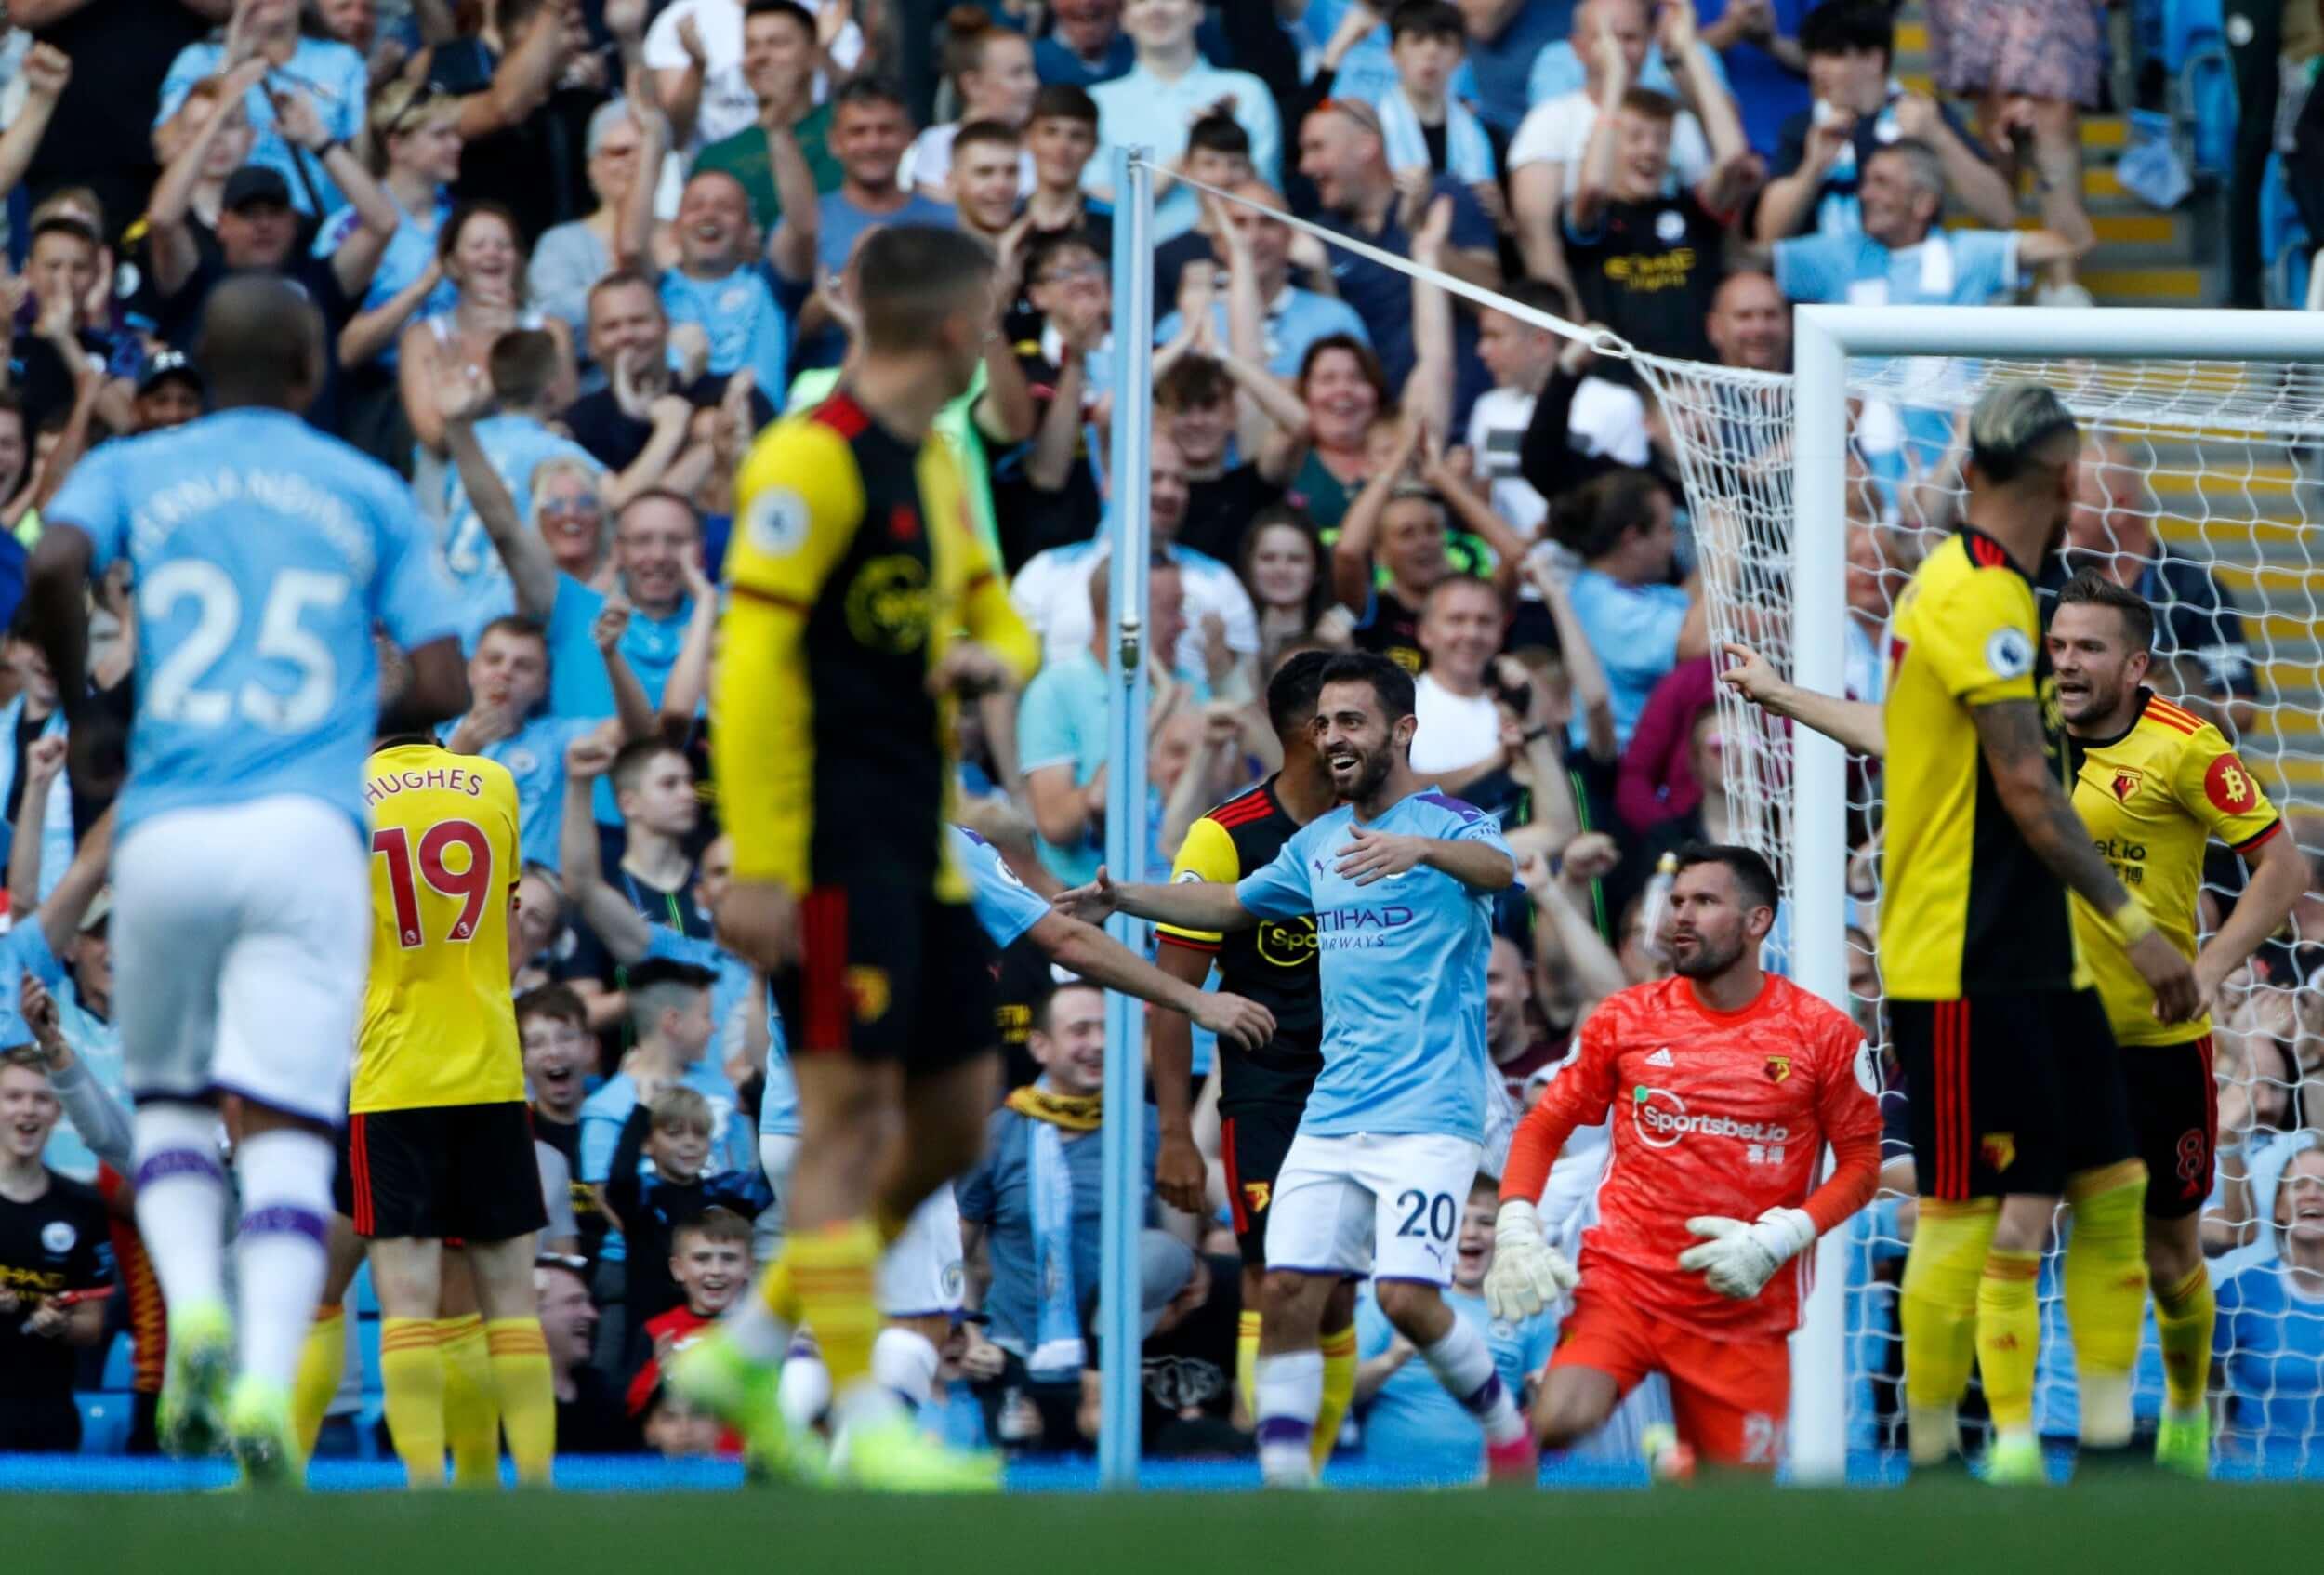 Leceister-shocks-Tottenham,-Man-City-humiliates-Watford